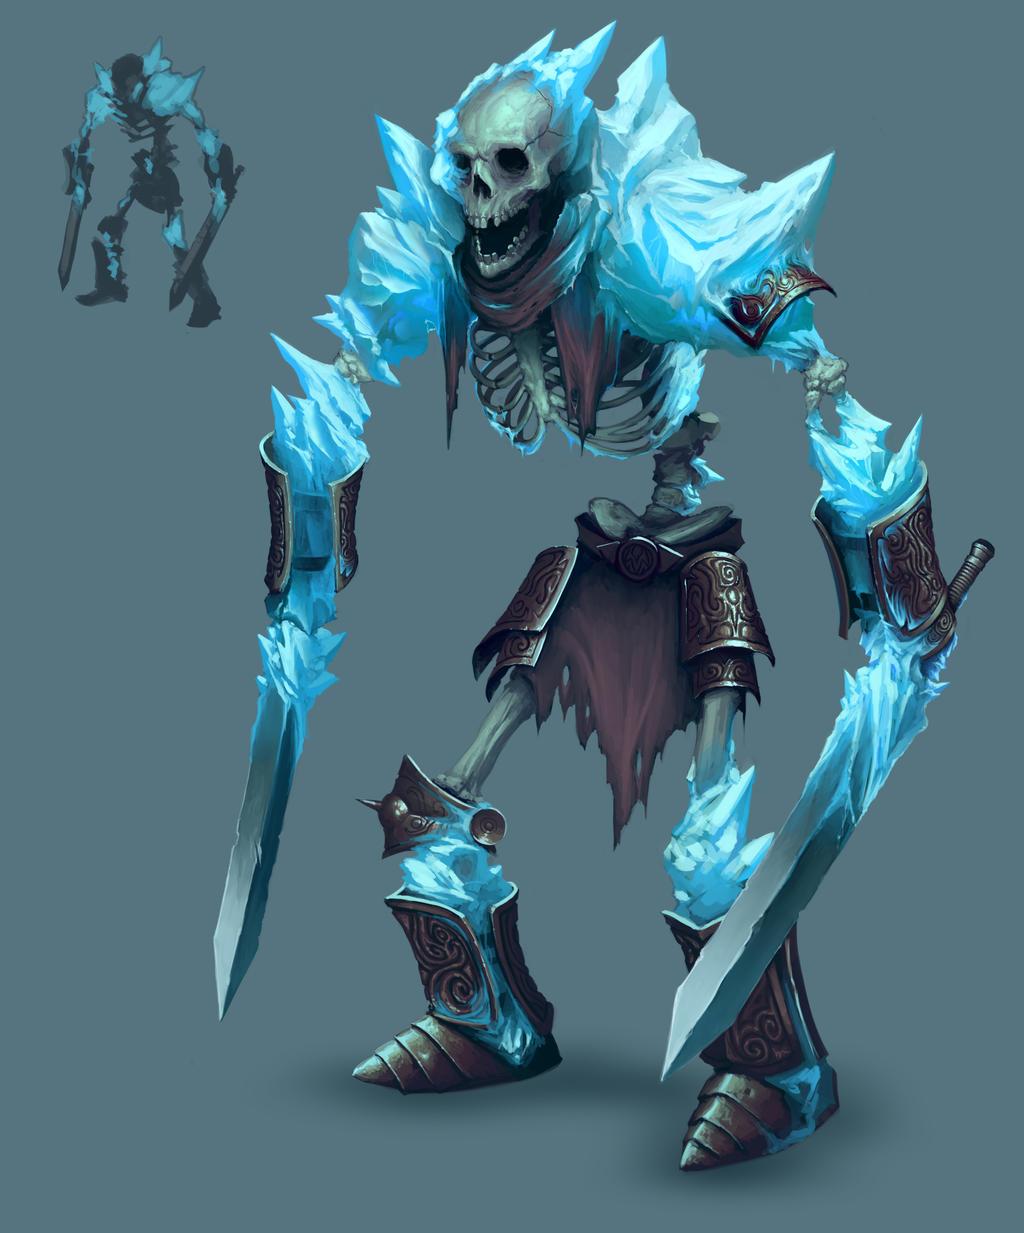 NUEVO EVENTO!!!! Frozen_maze___ice_skeleton_warrior_by_morkardfc-dapw1yu